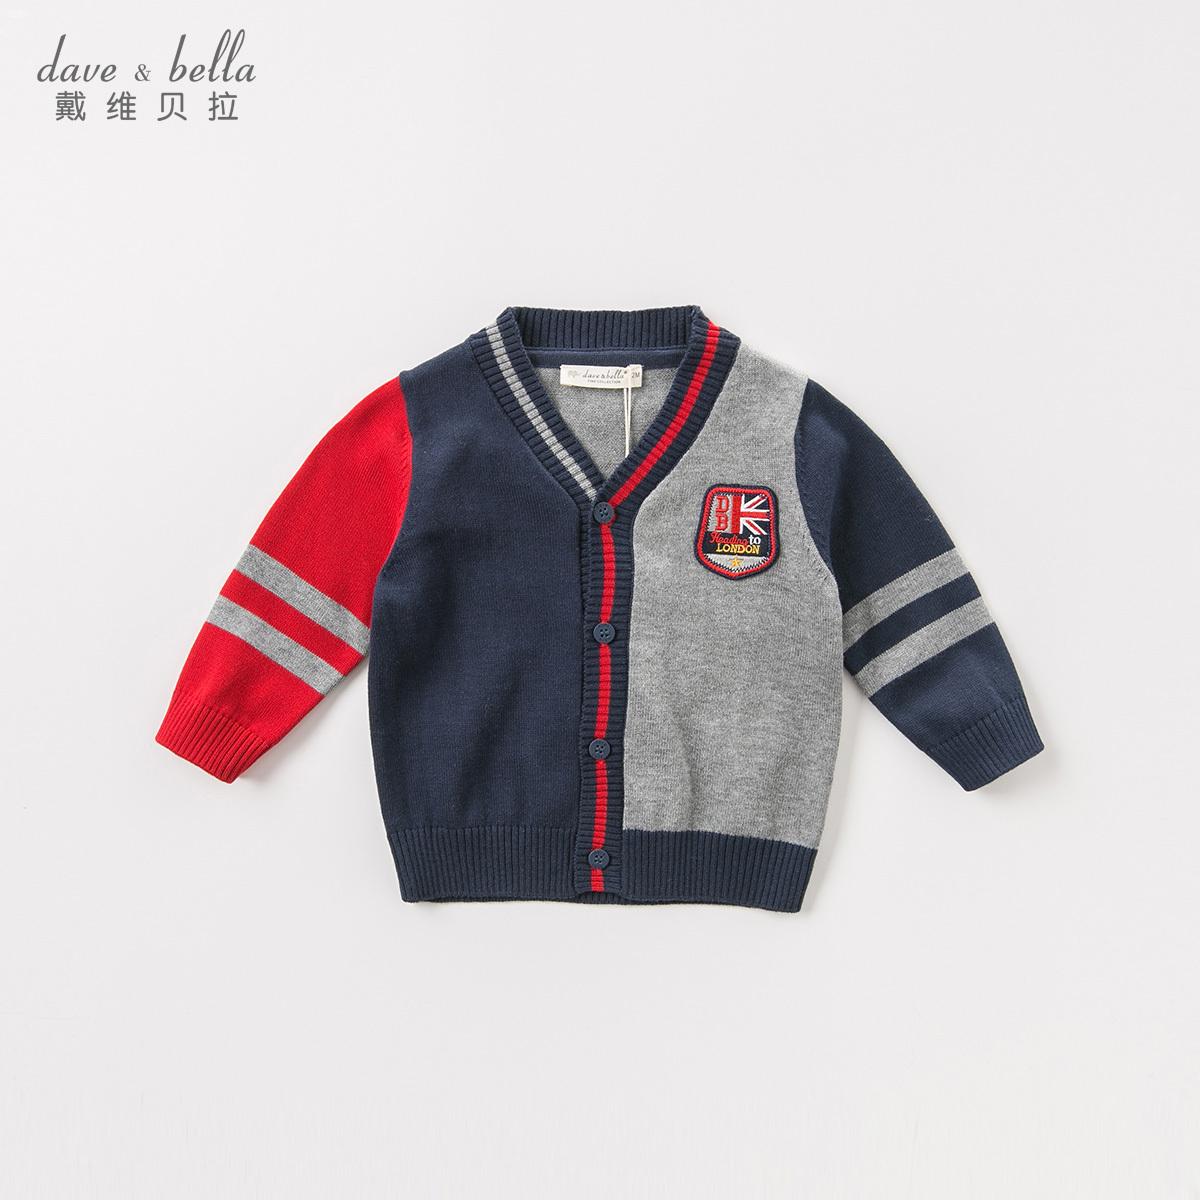 davebella戴维贝拉2018秋新款英伦风男童毛衣 宝宝针织开衫DB8432